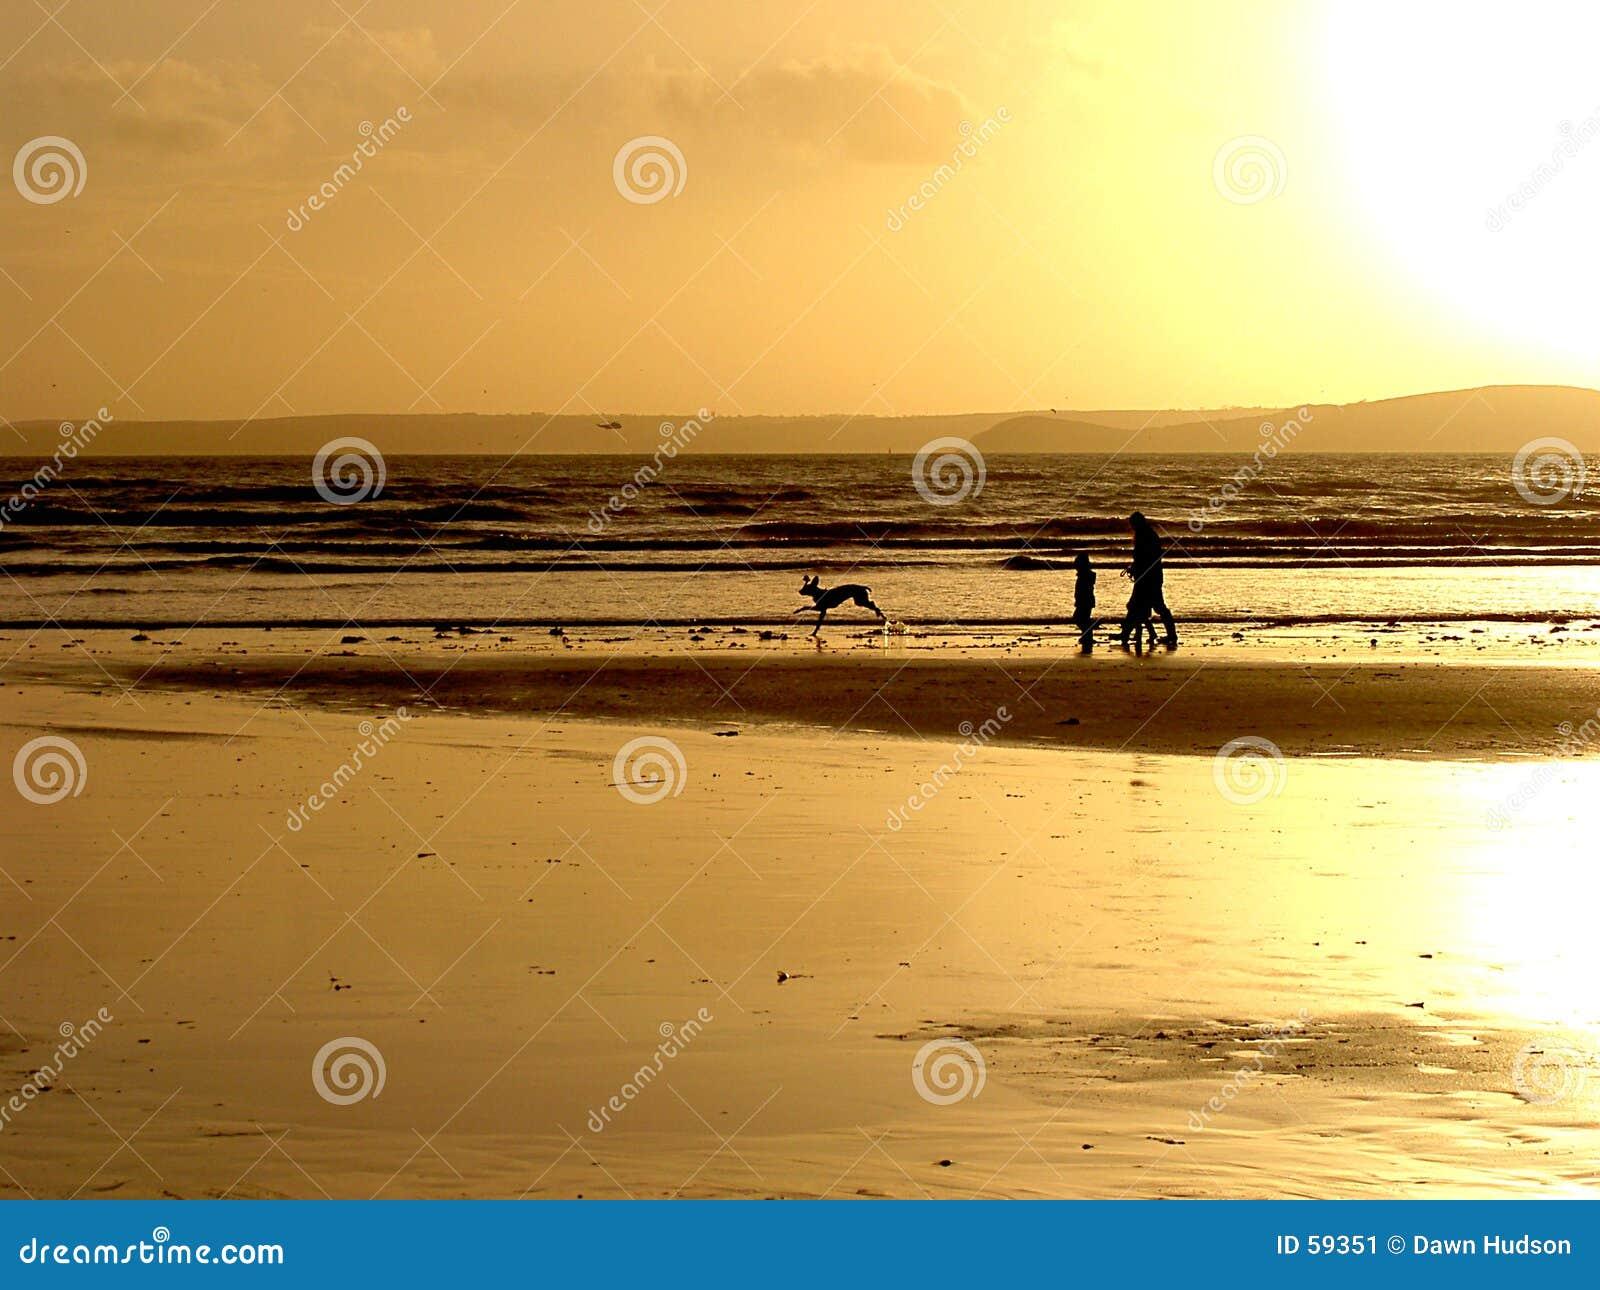 Ciemniusieńki na plaży